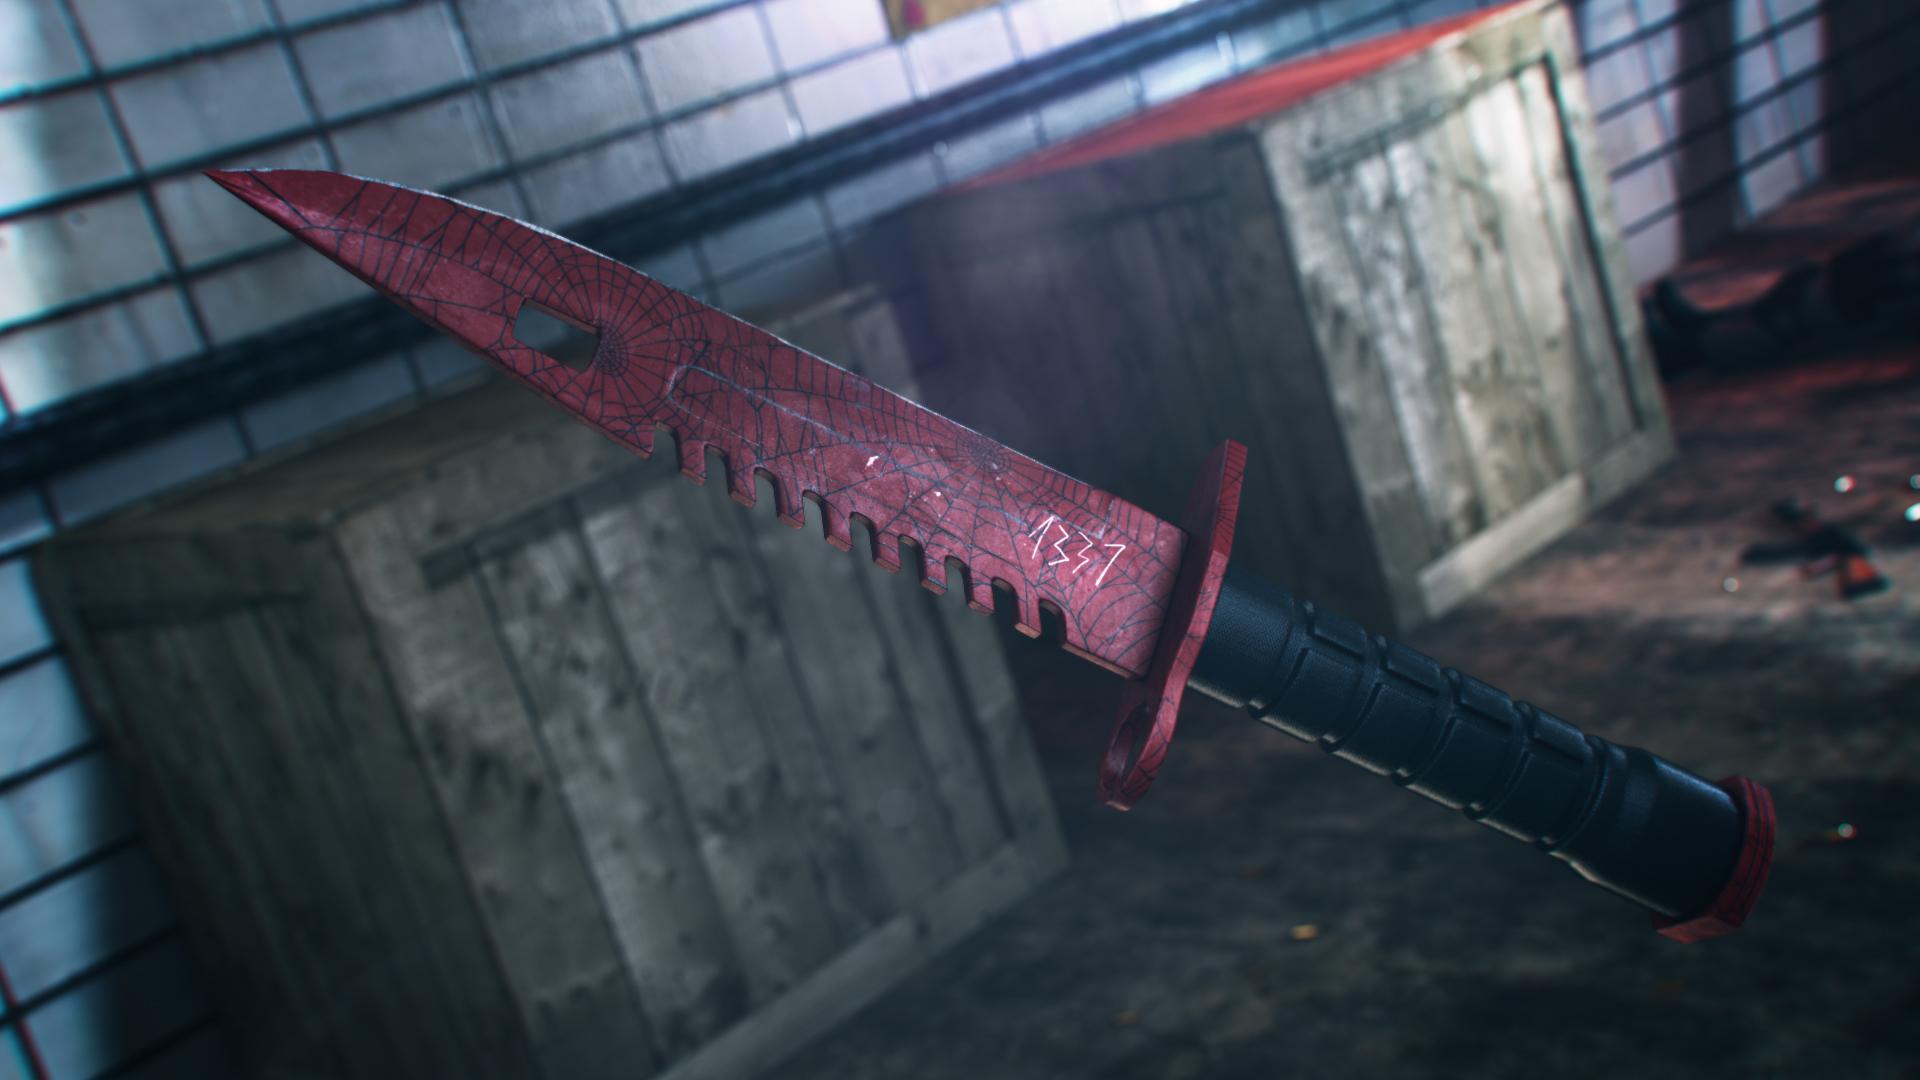 m9 bayonet crimson web 3d cs go wallpapers and backgrounds